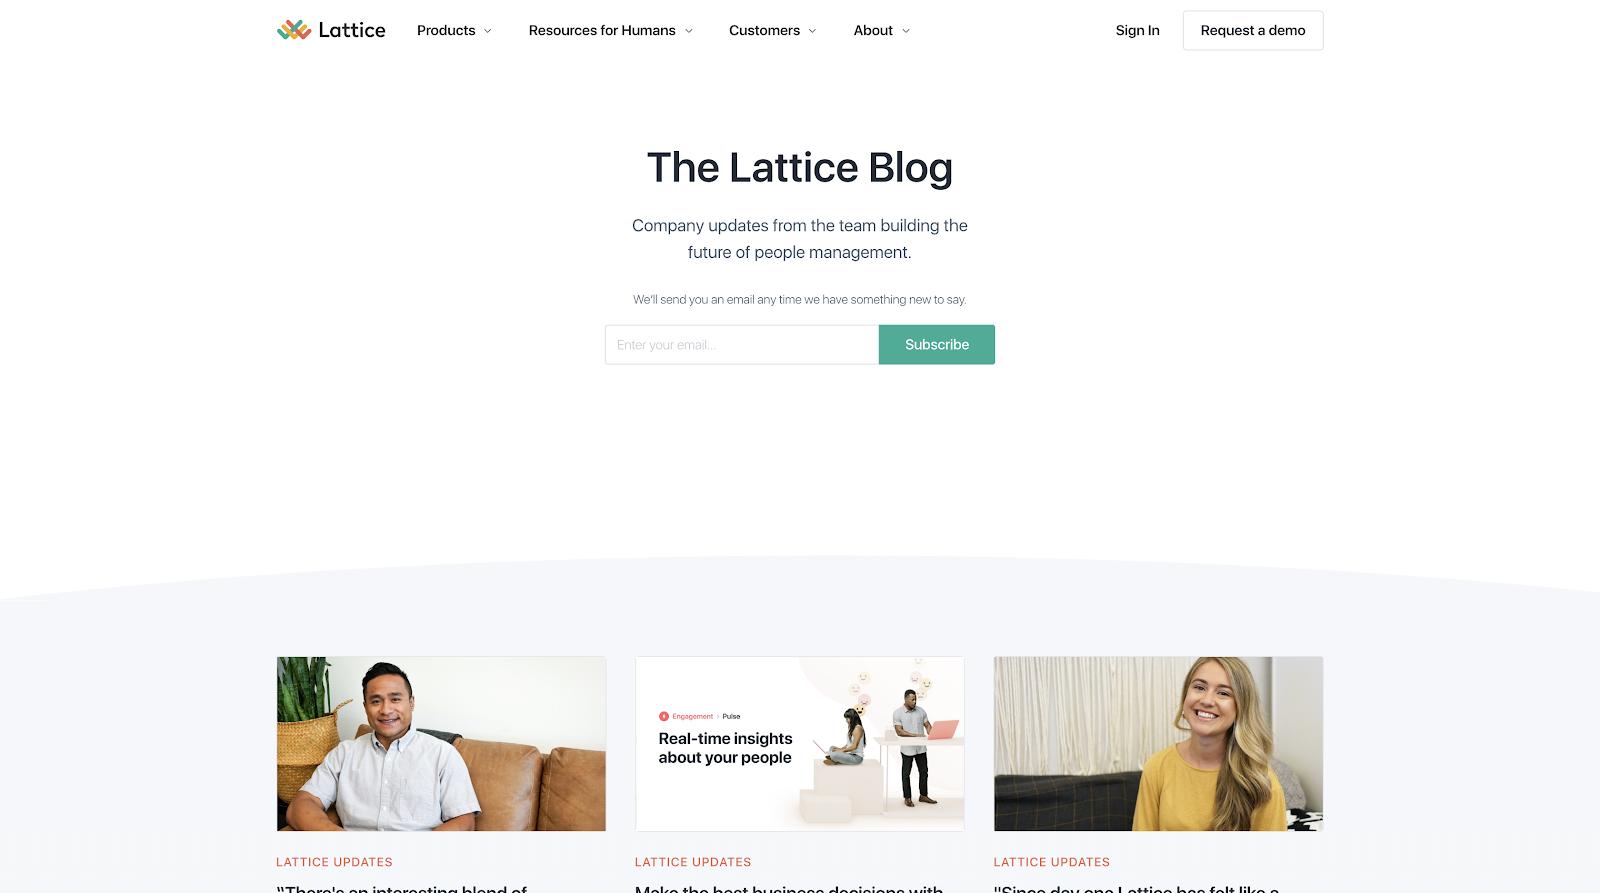 lattice blog